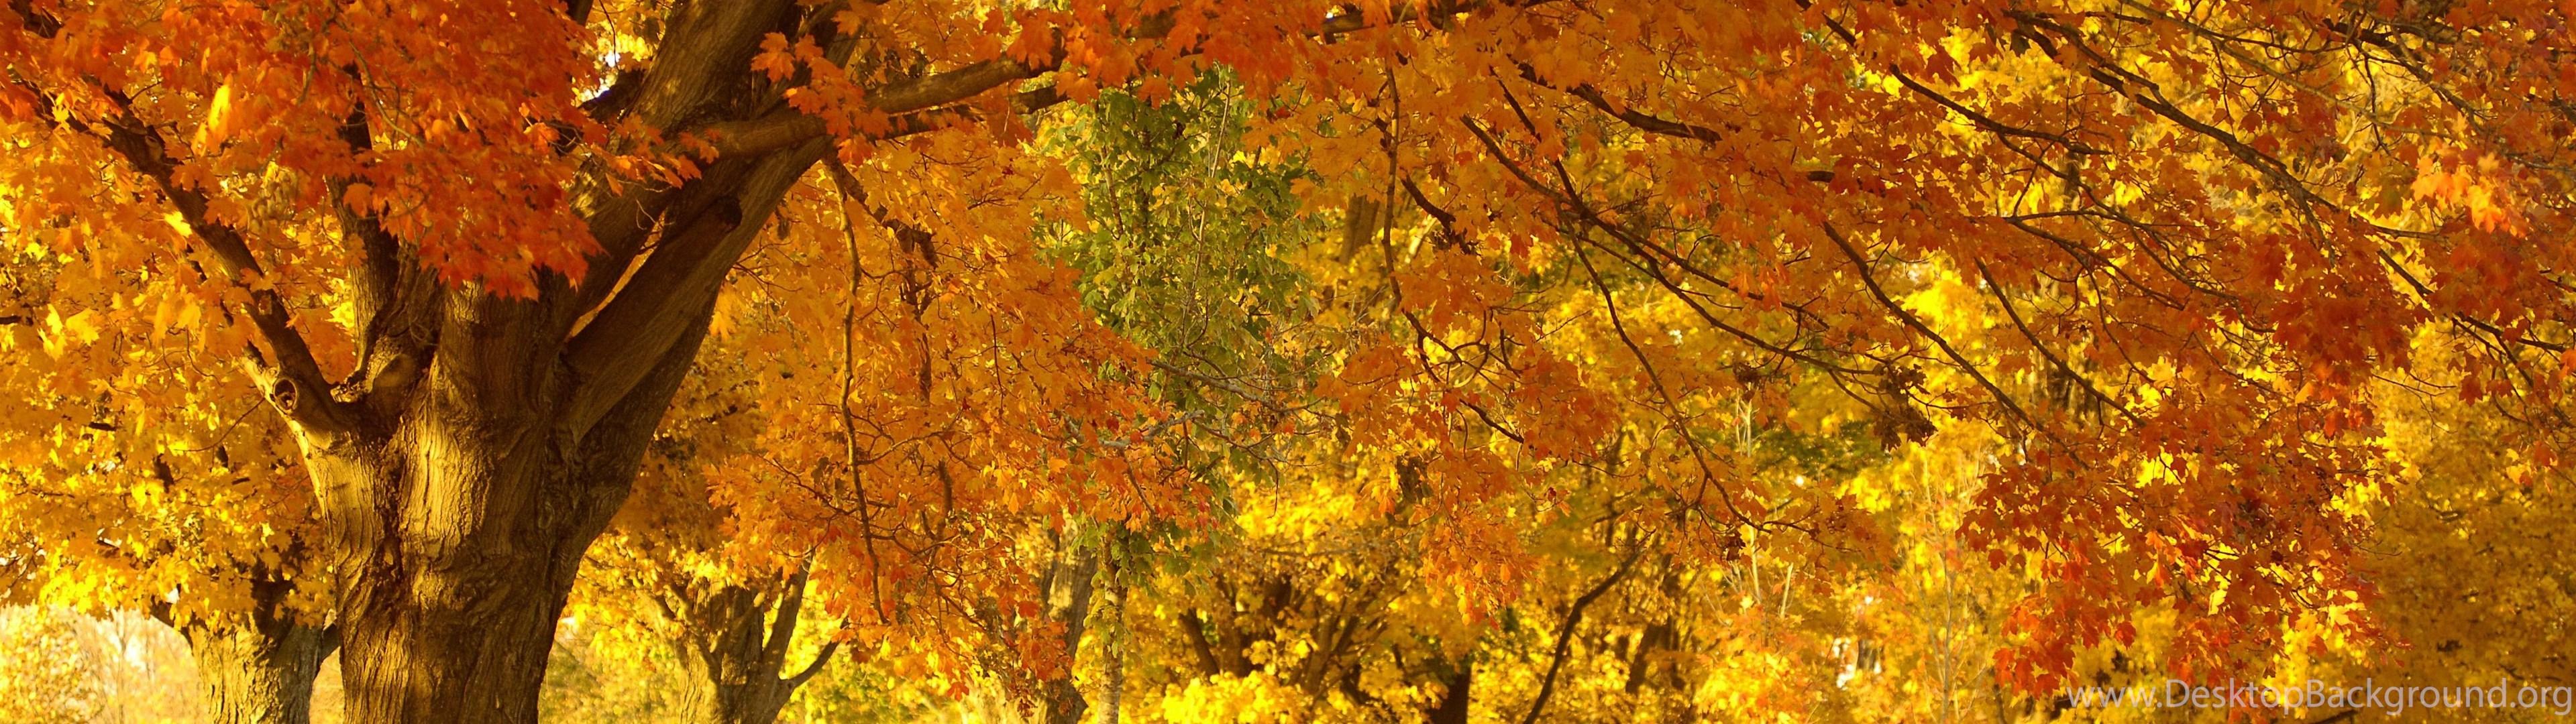 dried autumn leaf hd wallpapers desktop background